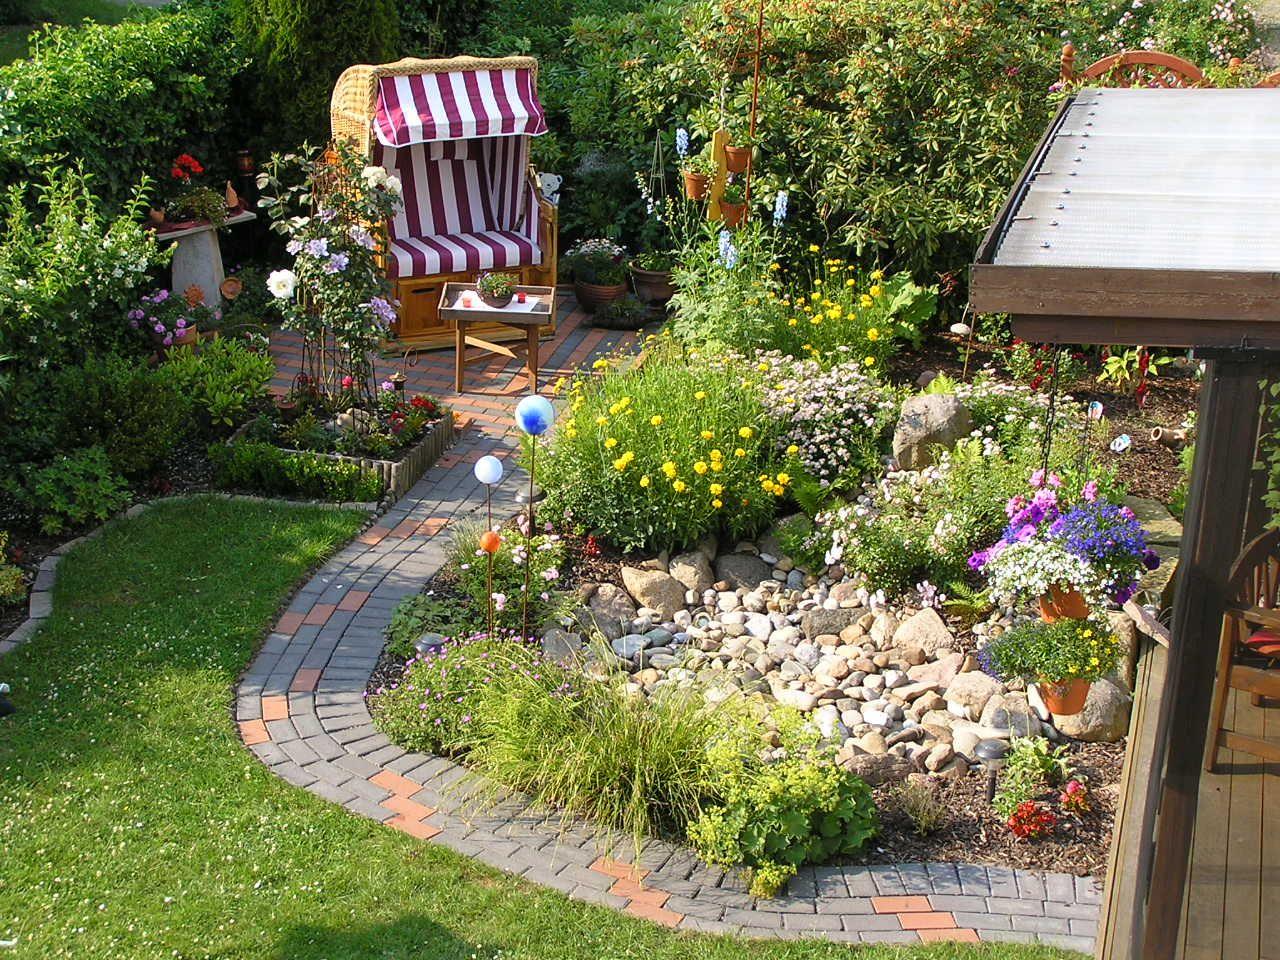 Reihenhausgarten (Townhouse Garden) with patio, big beach